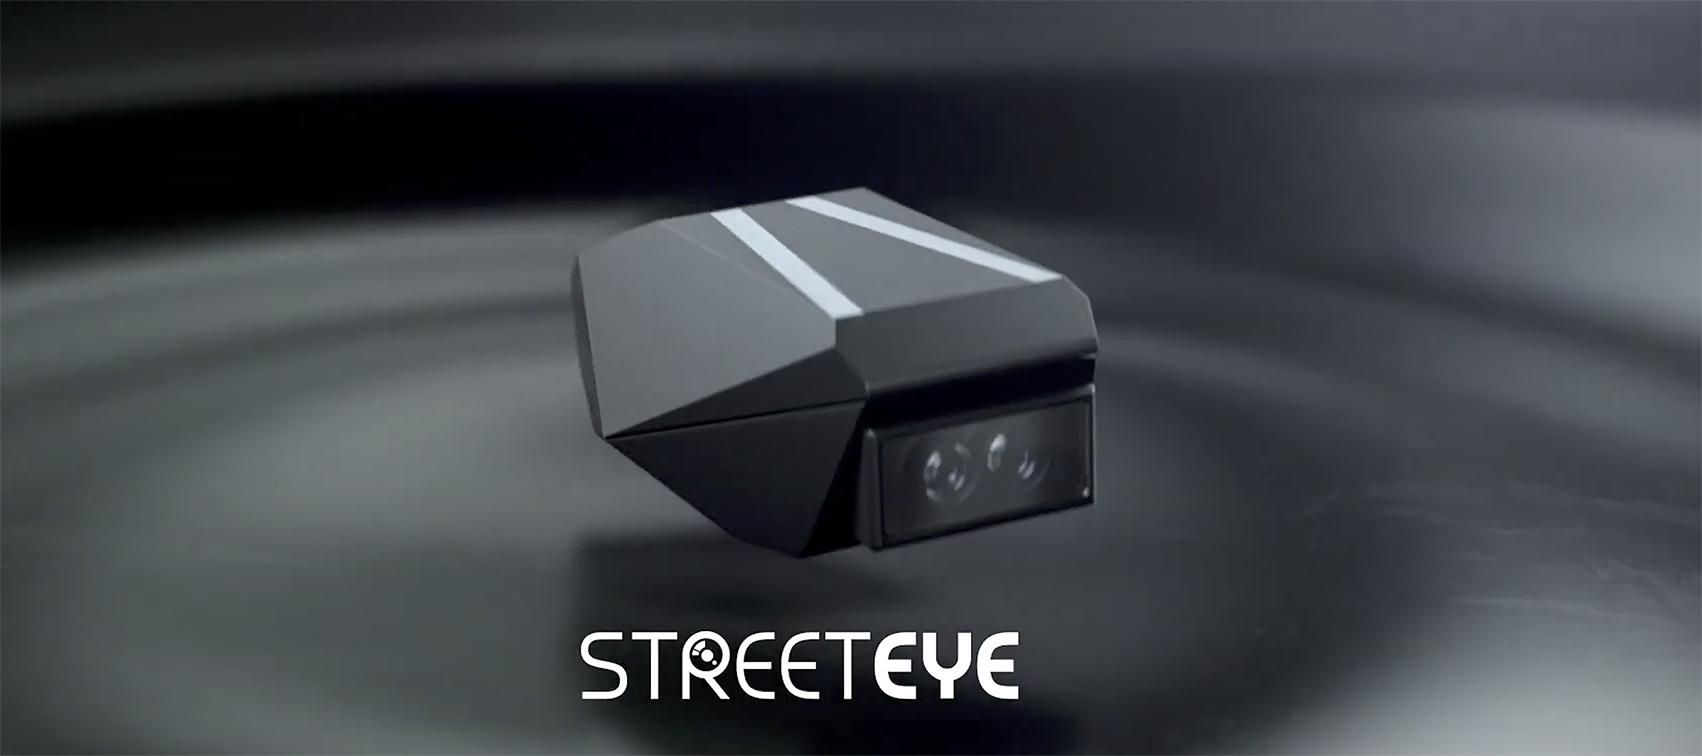 Leo Burnett India scores honoree at Fast Company Innovation by Design Awards 2021 for 'StreetEye'